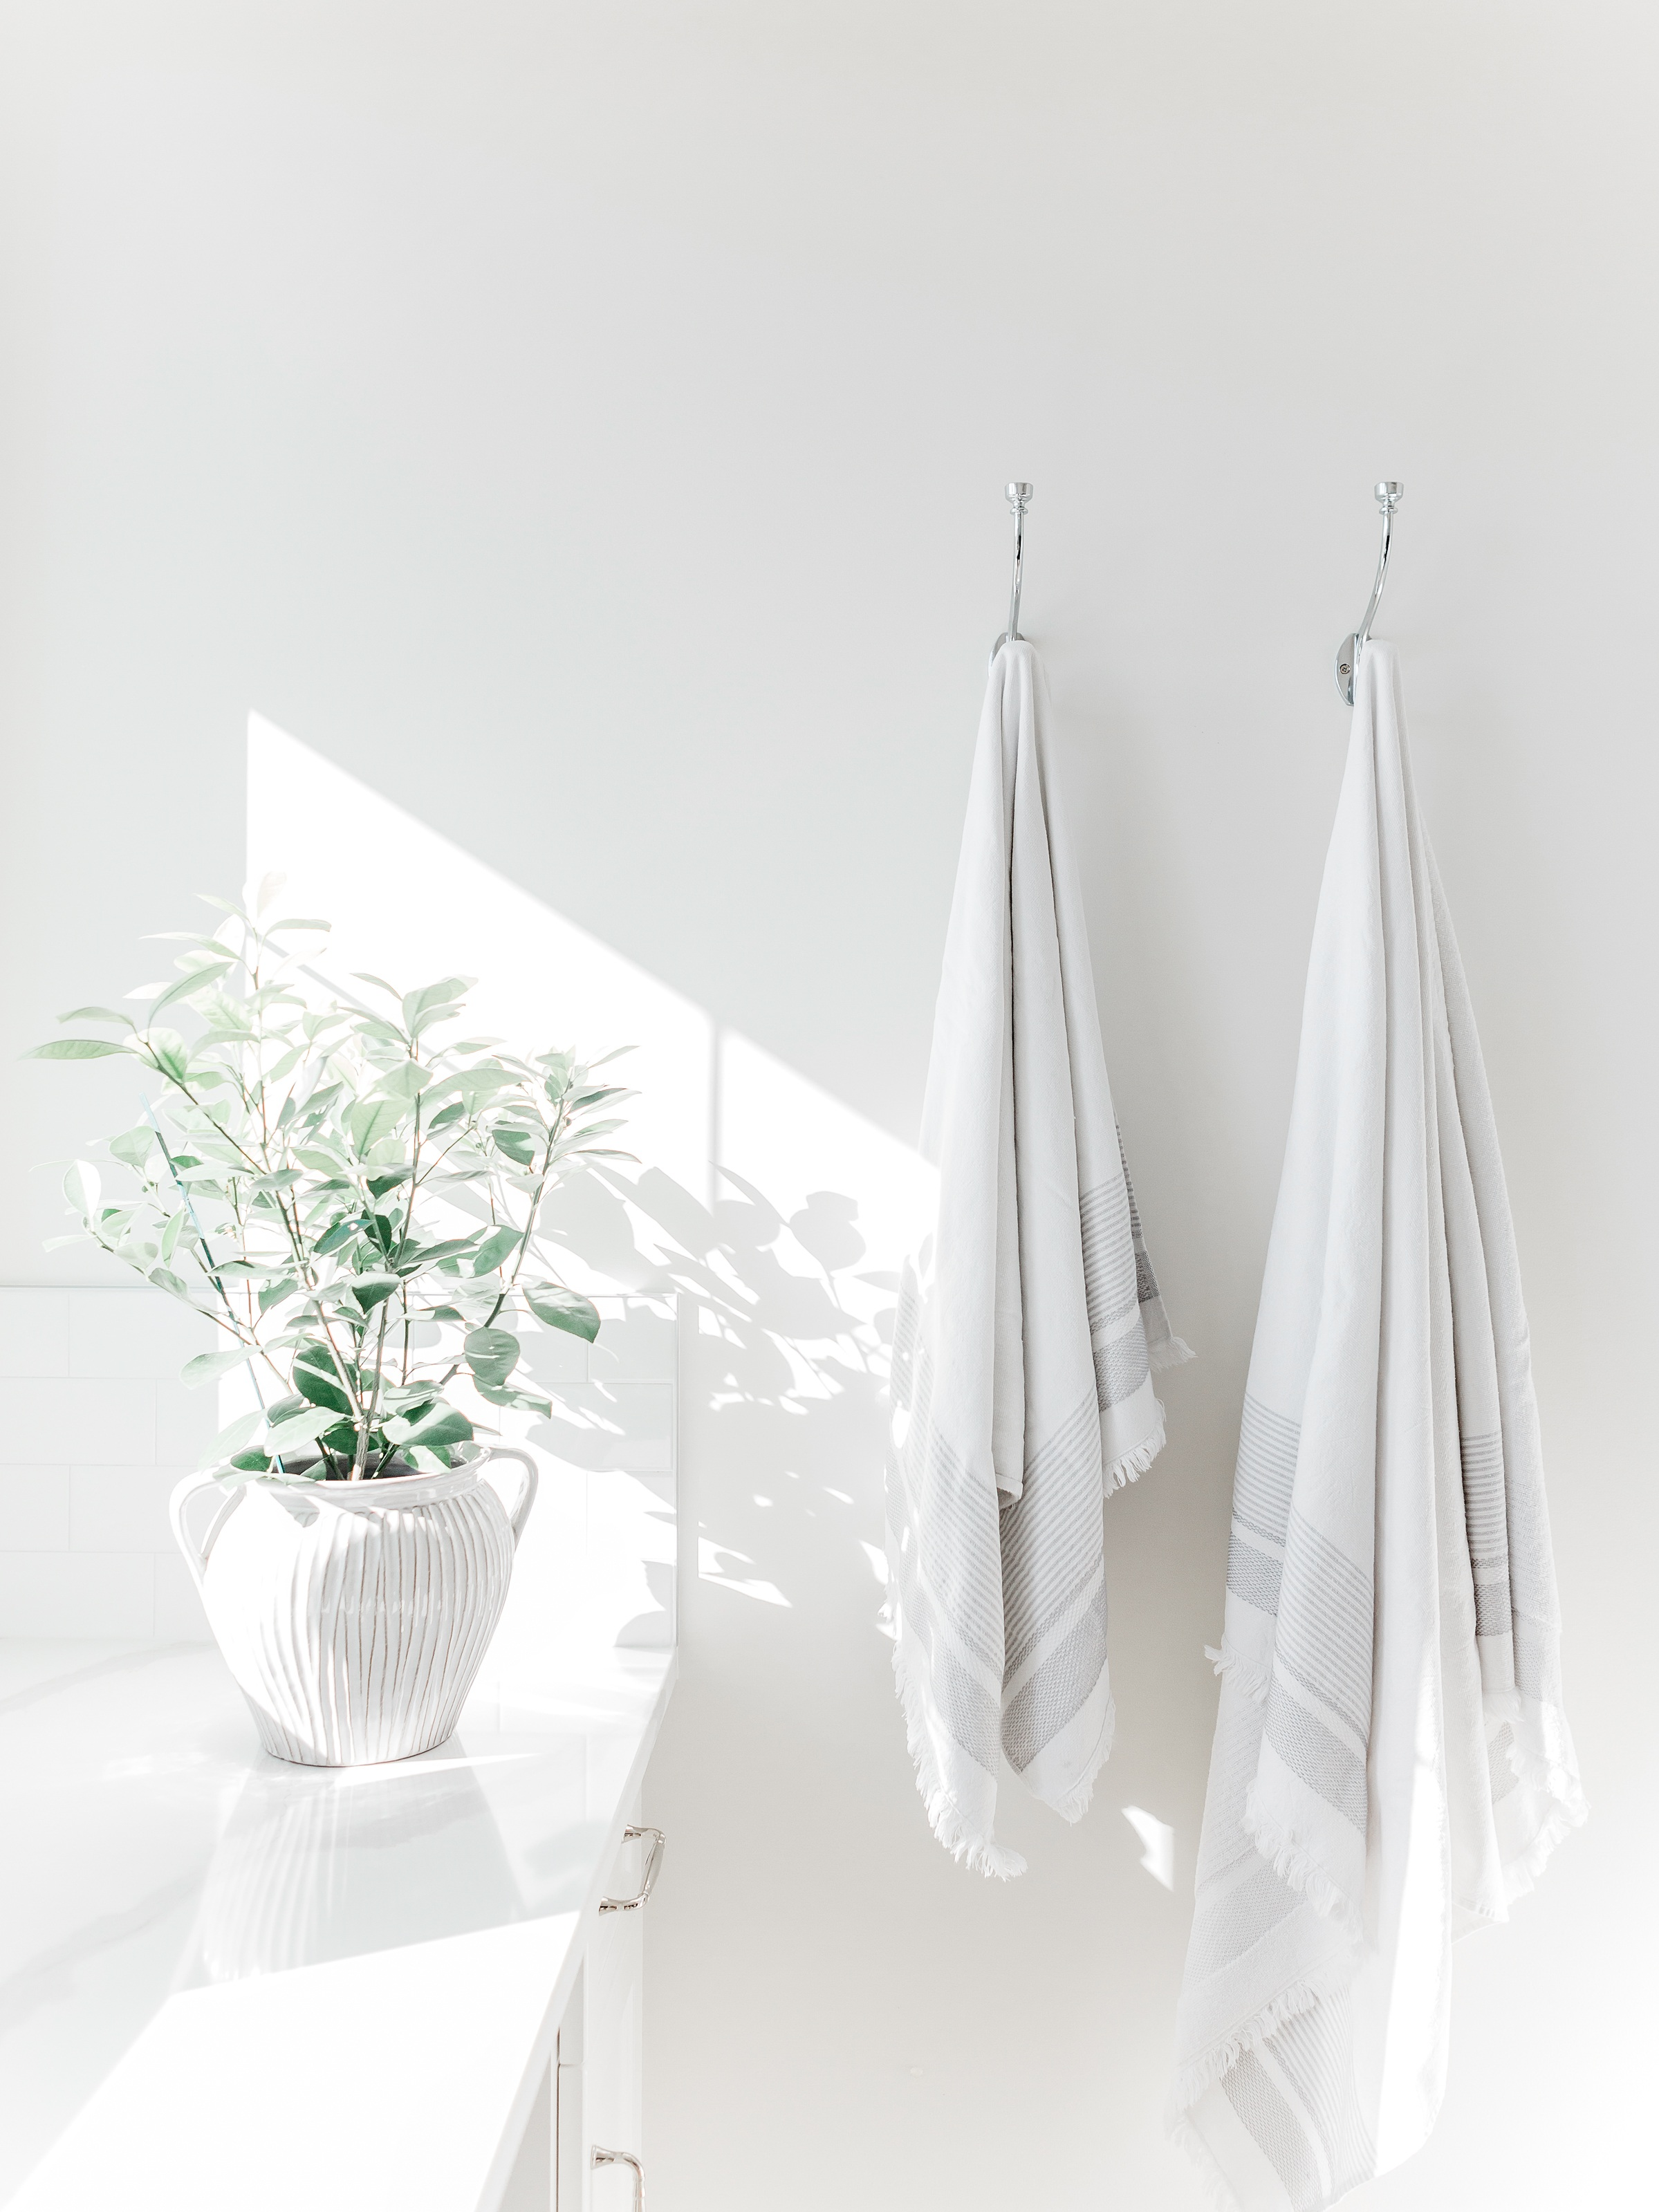 haute-stock-photography-laundry-bath-finals-4.jpg